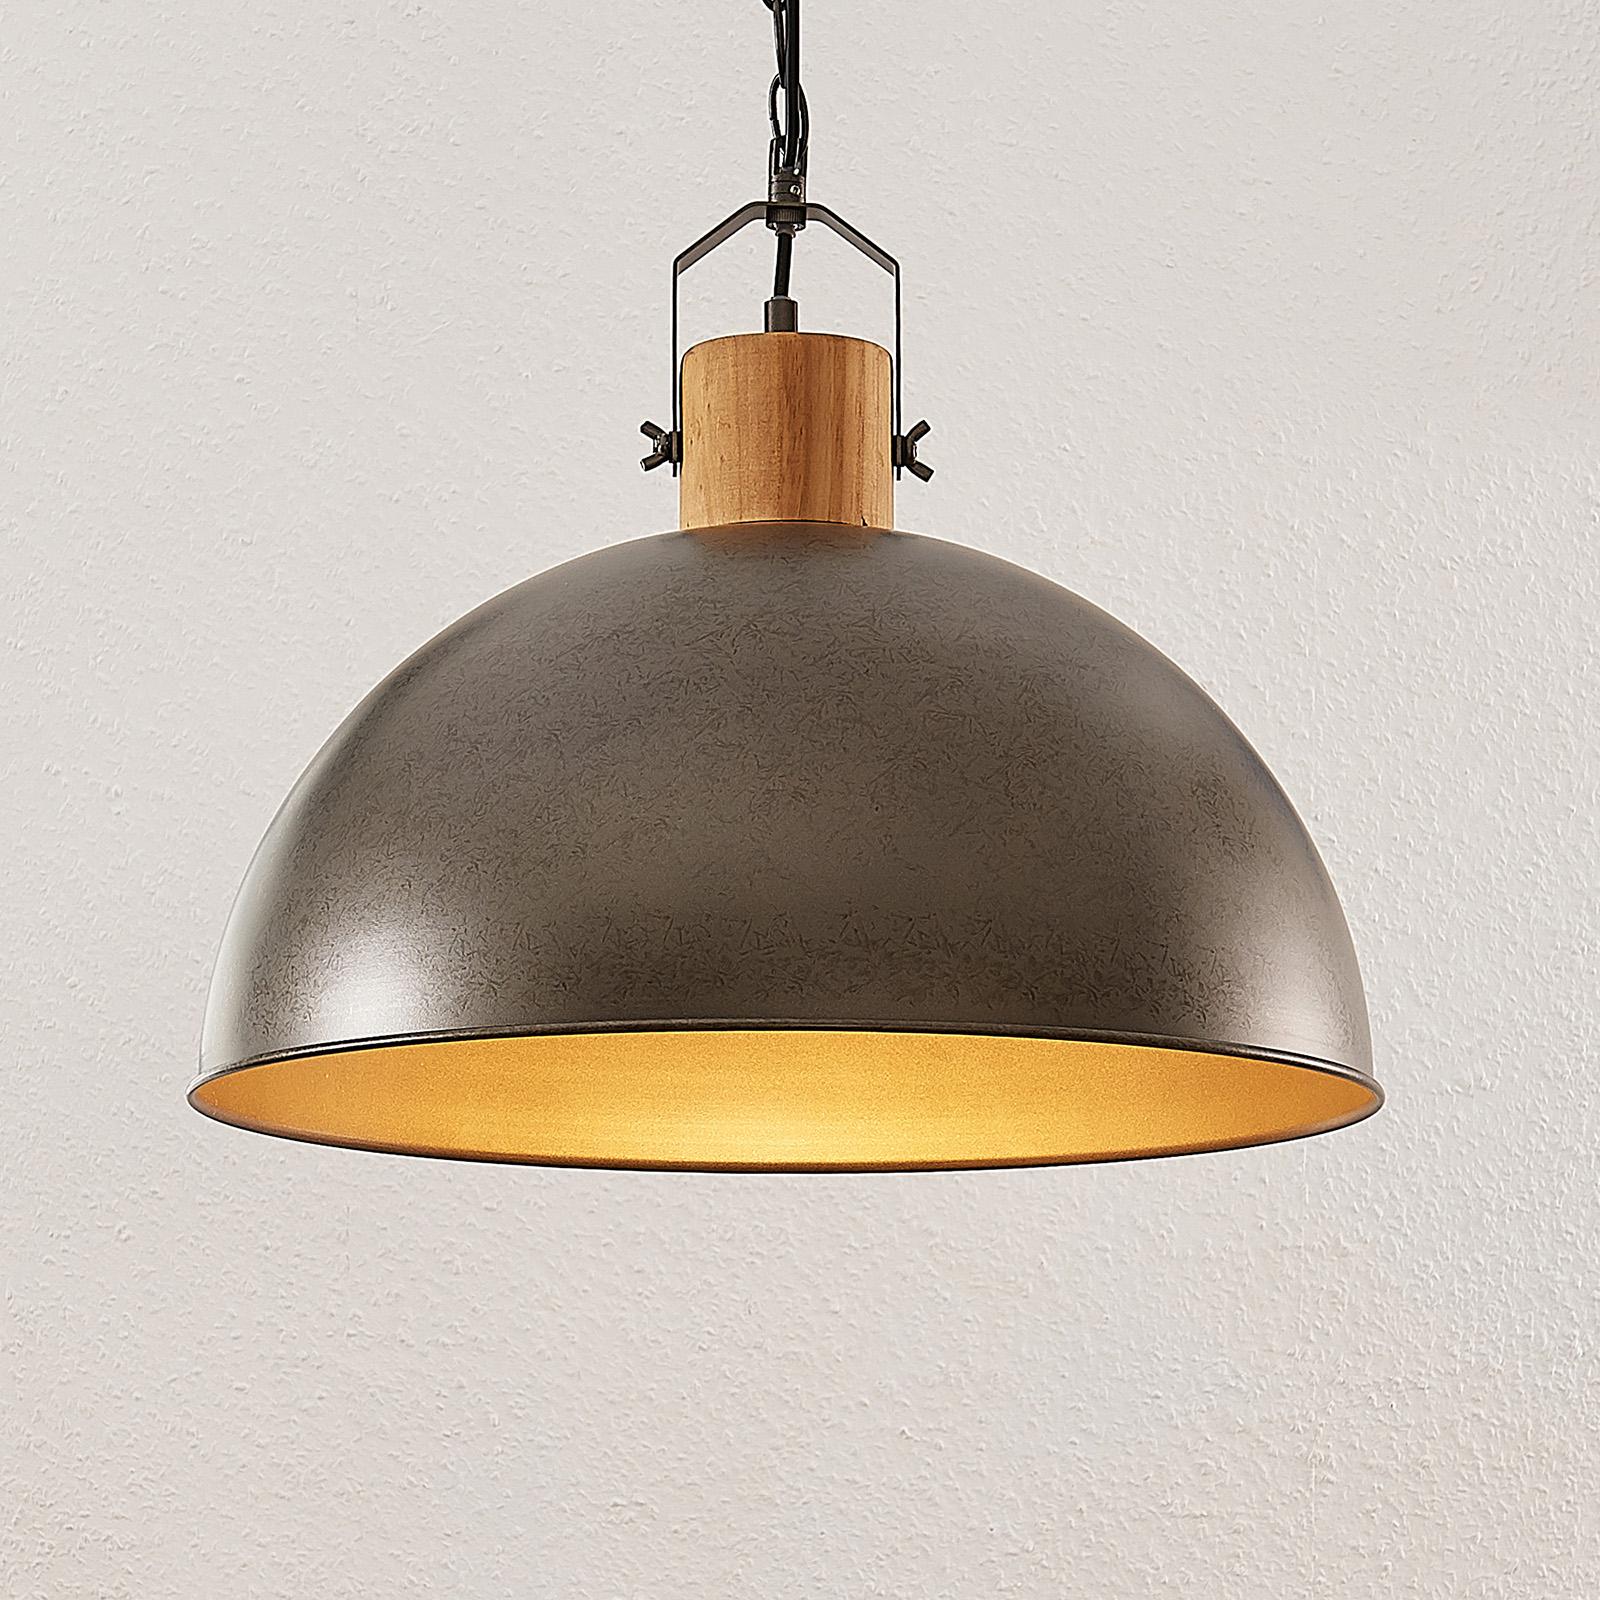 Lindby Holgar Suspension avec abat-jour métallique